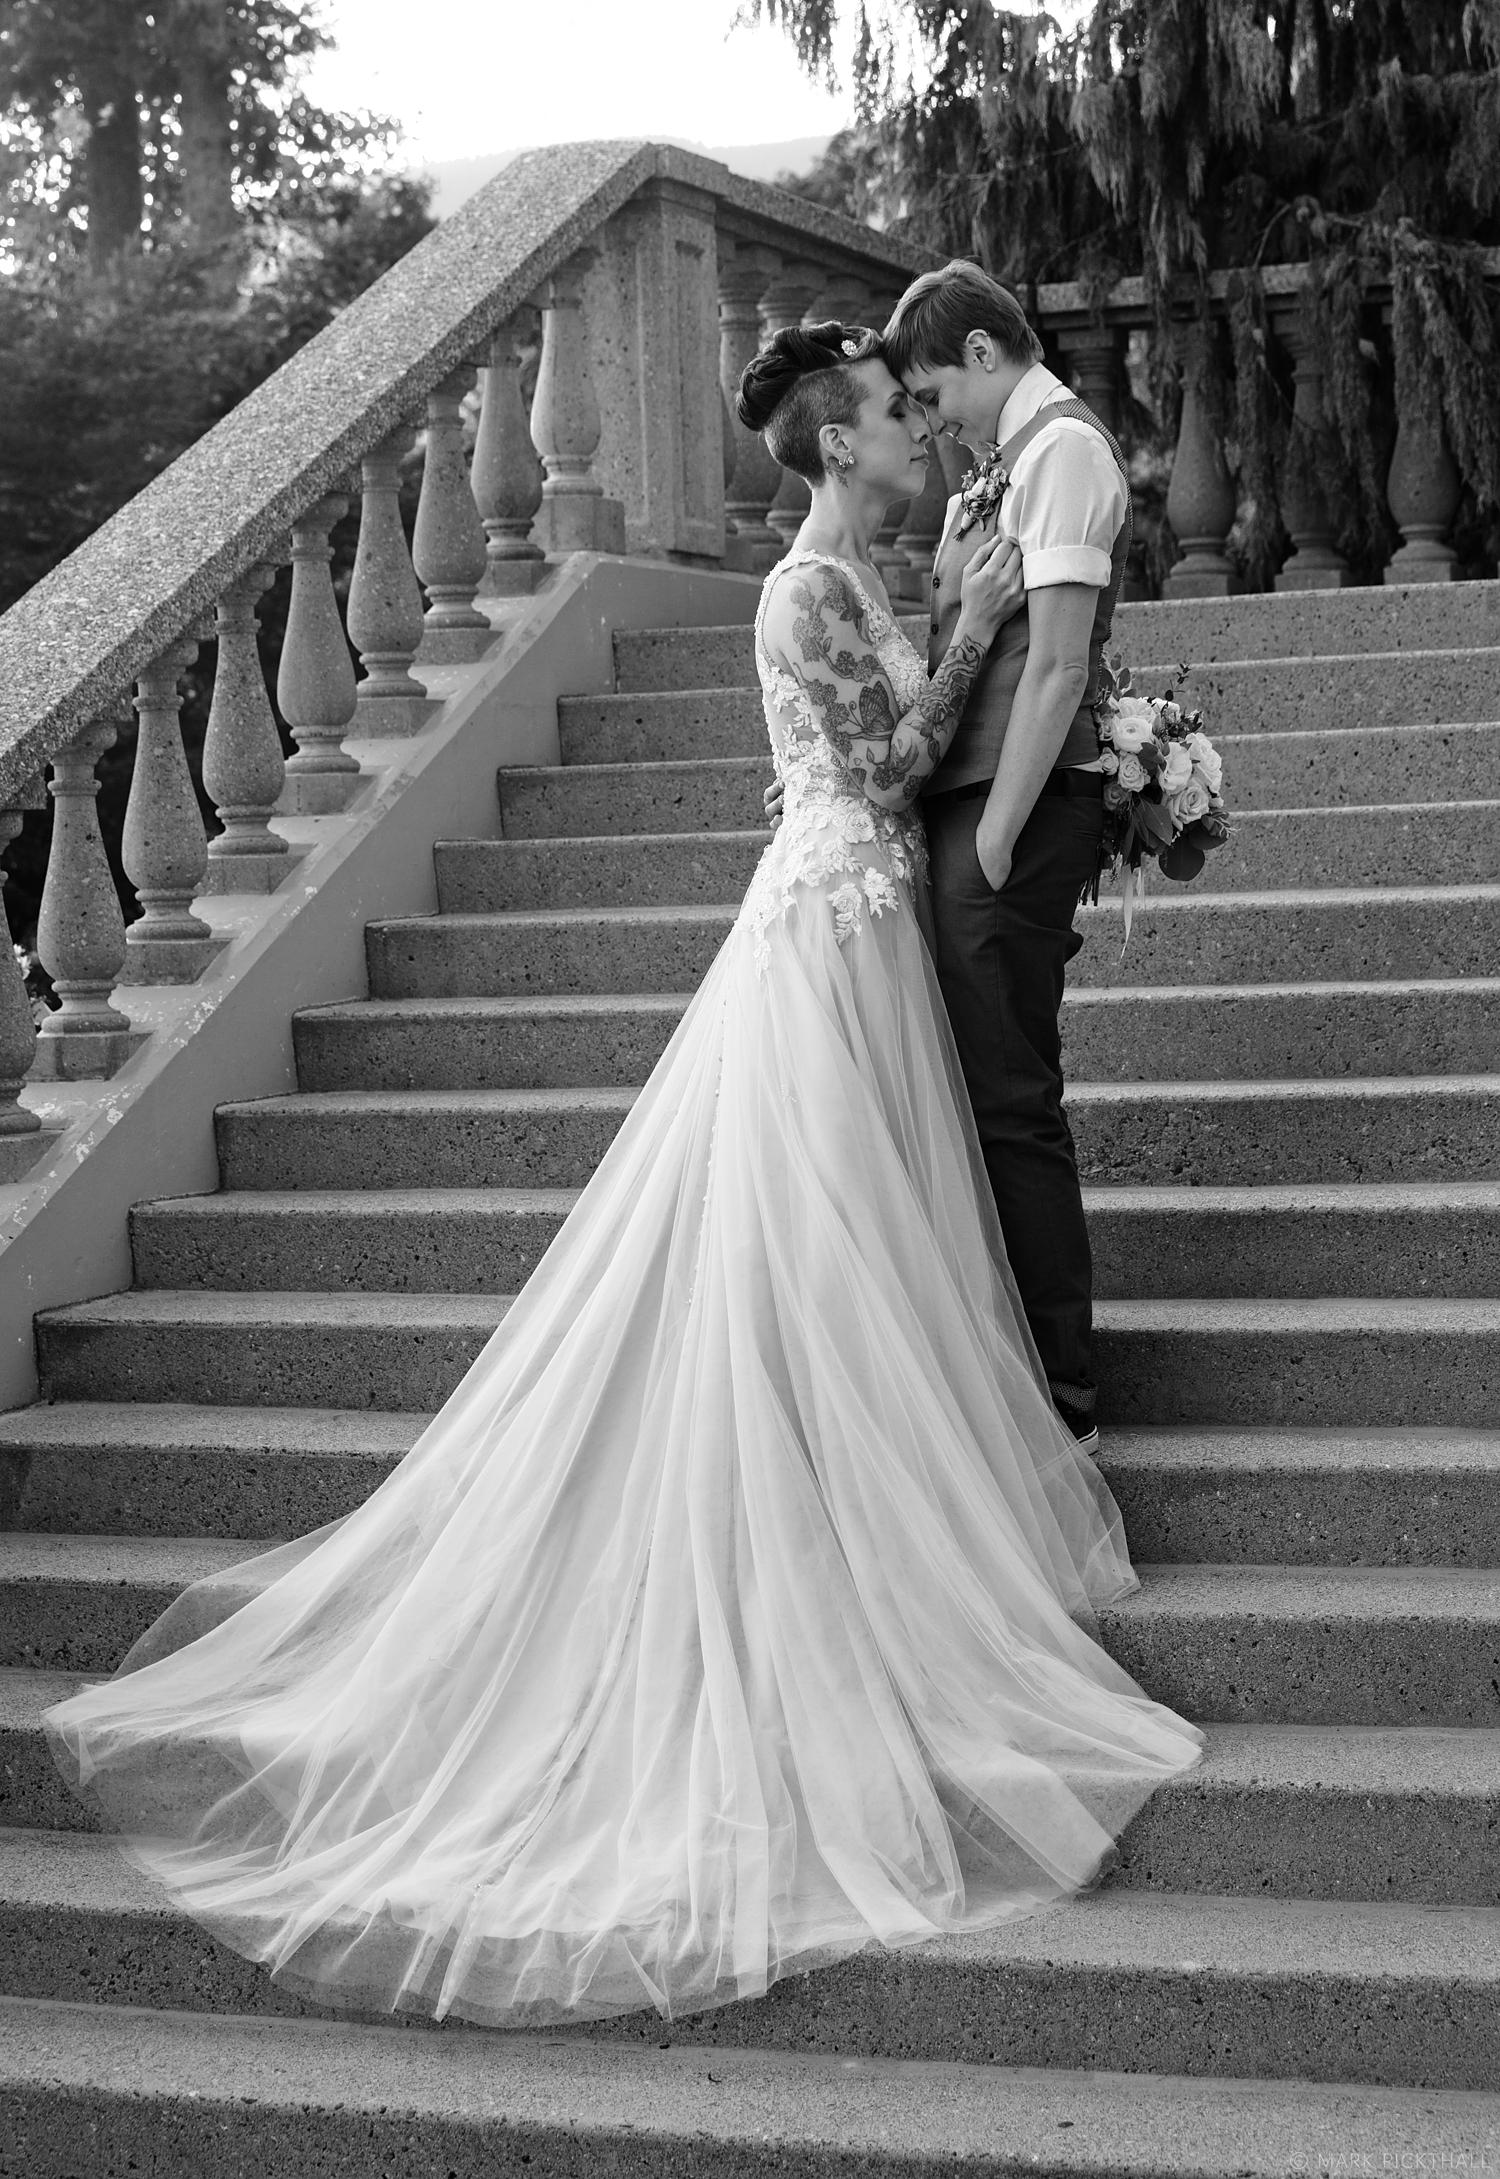 Wedding photography, Monochrome, love